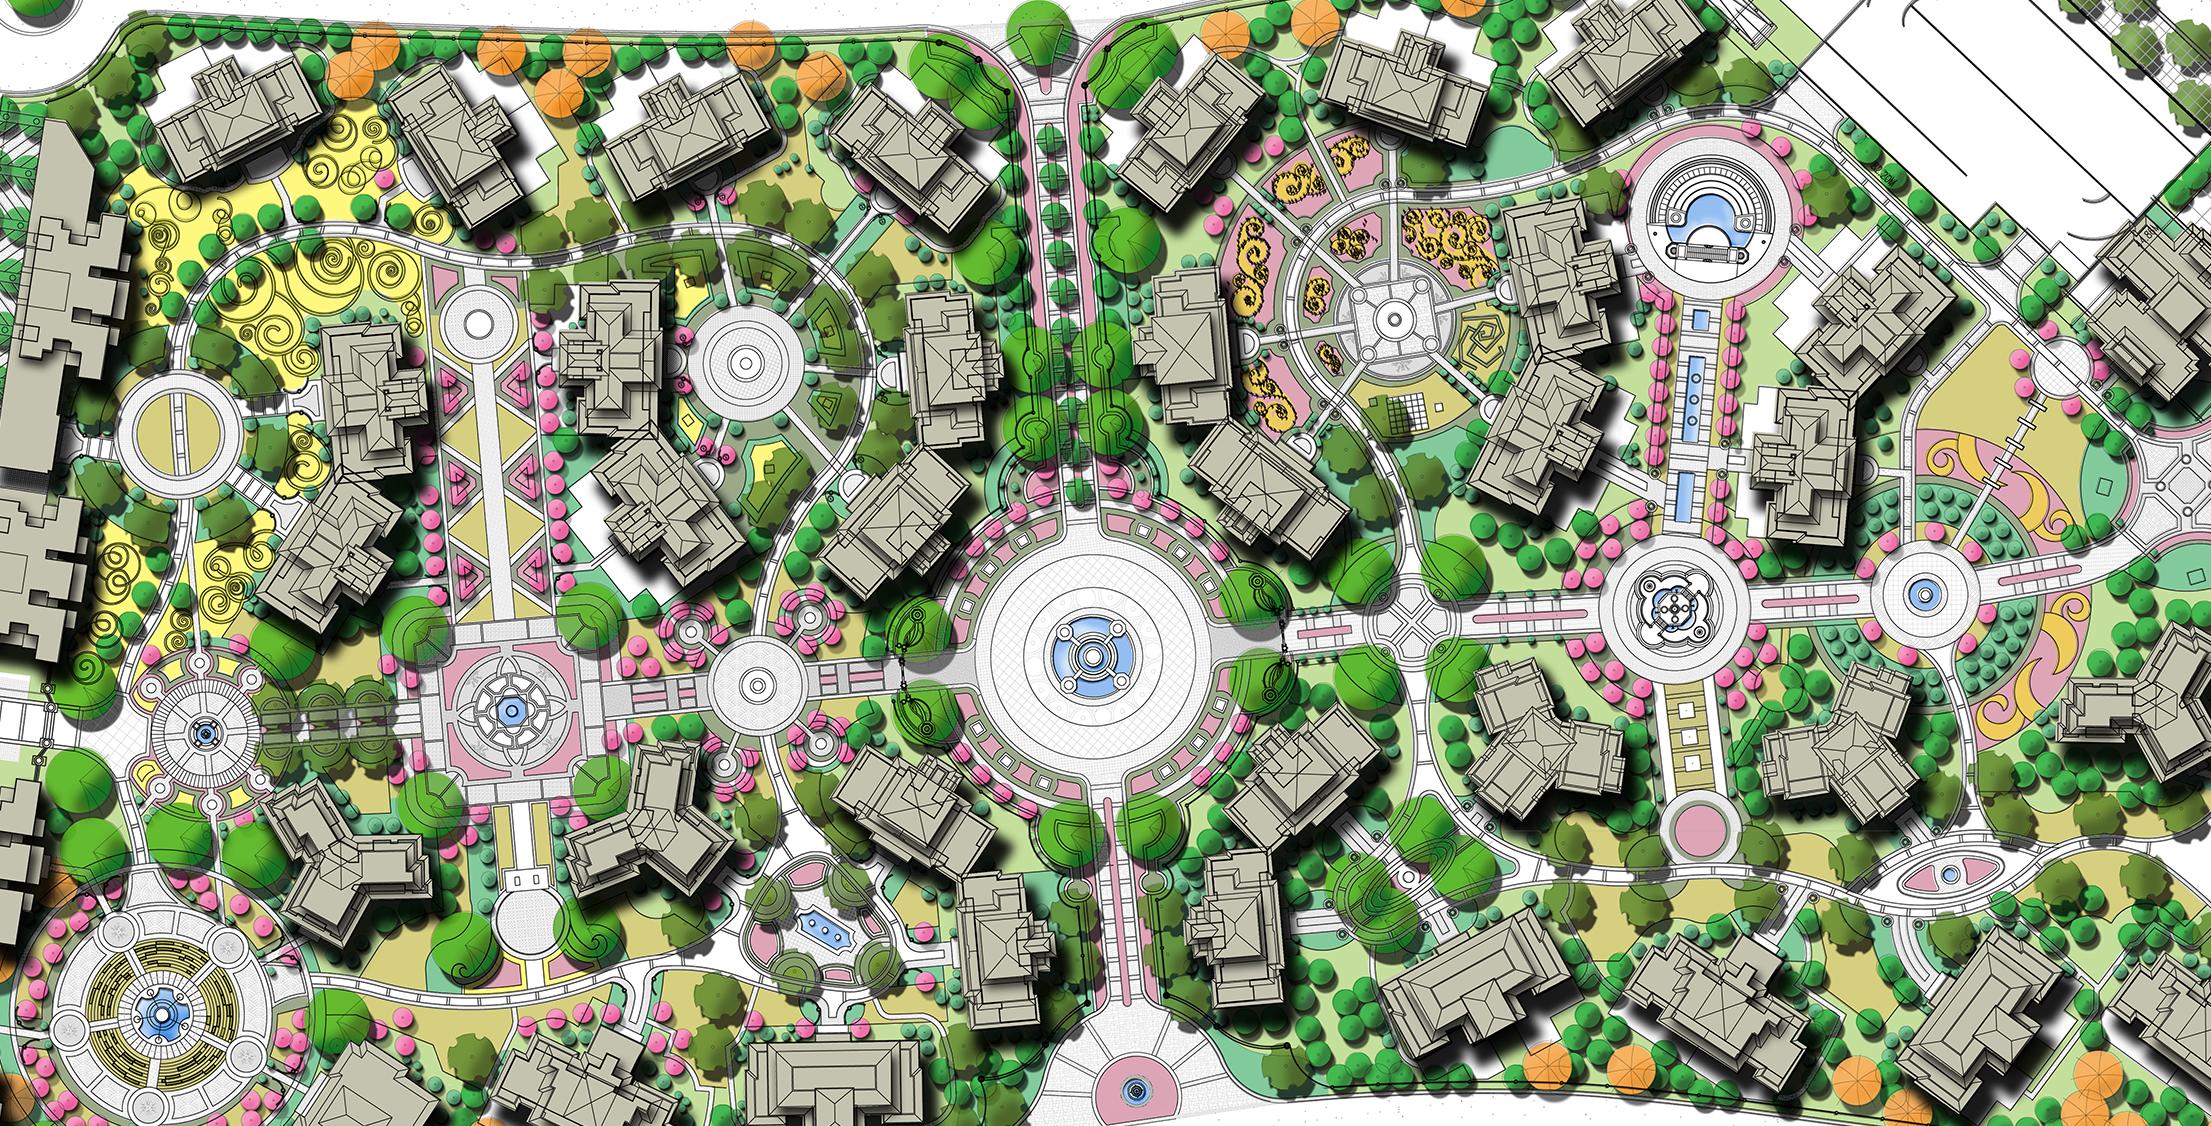 Illustrative plan-sm-crop.jpg